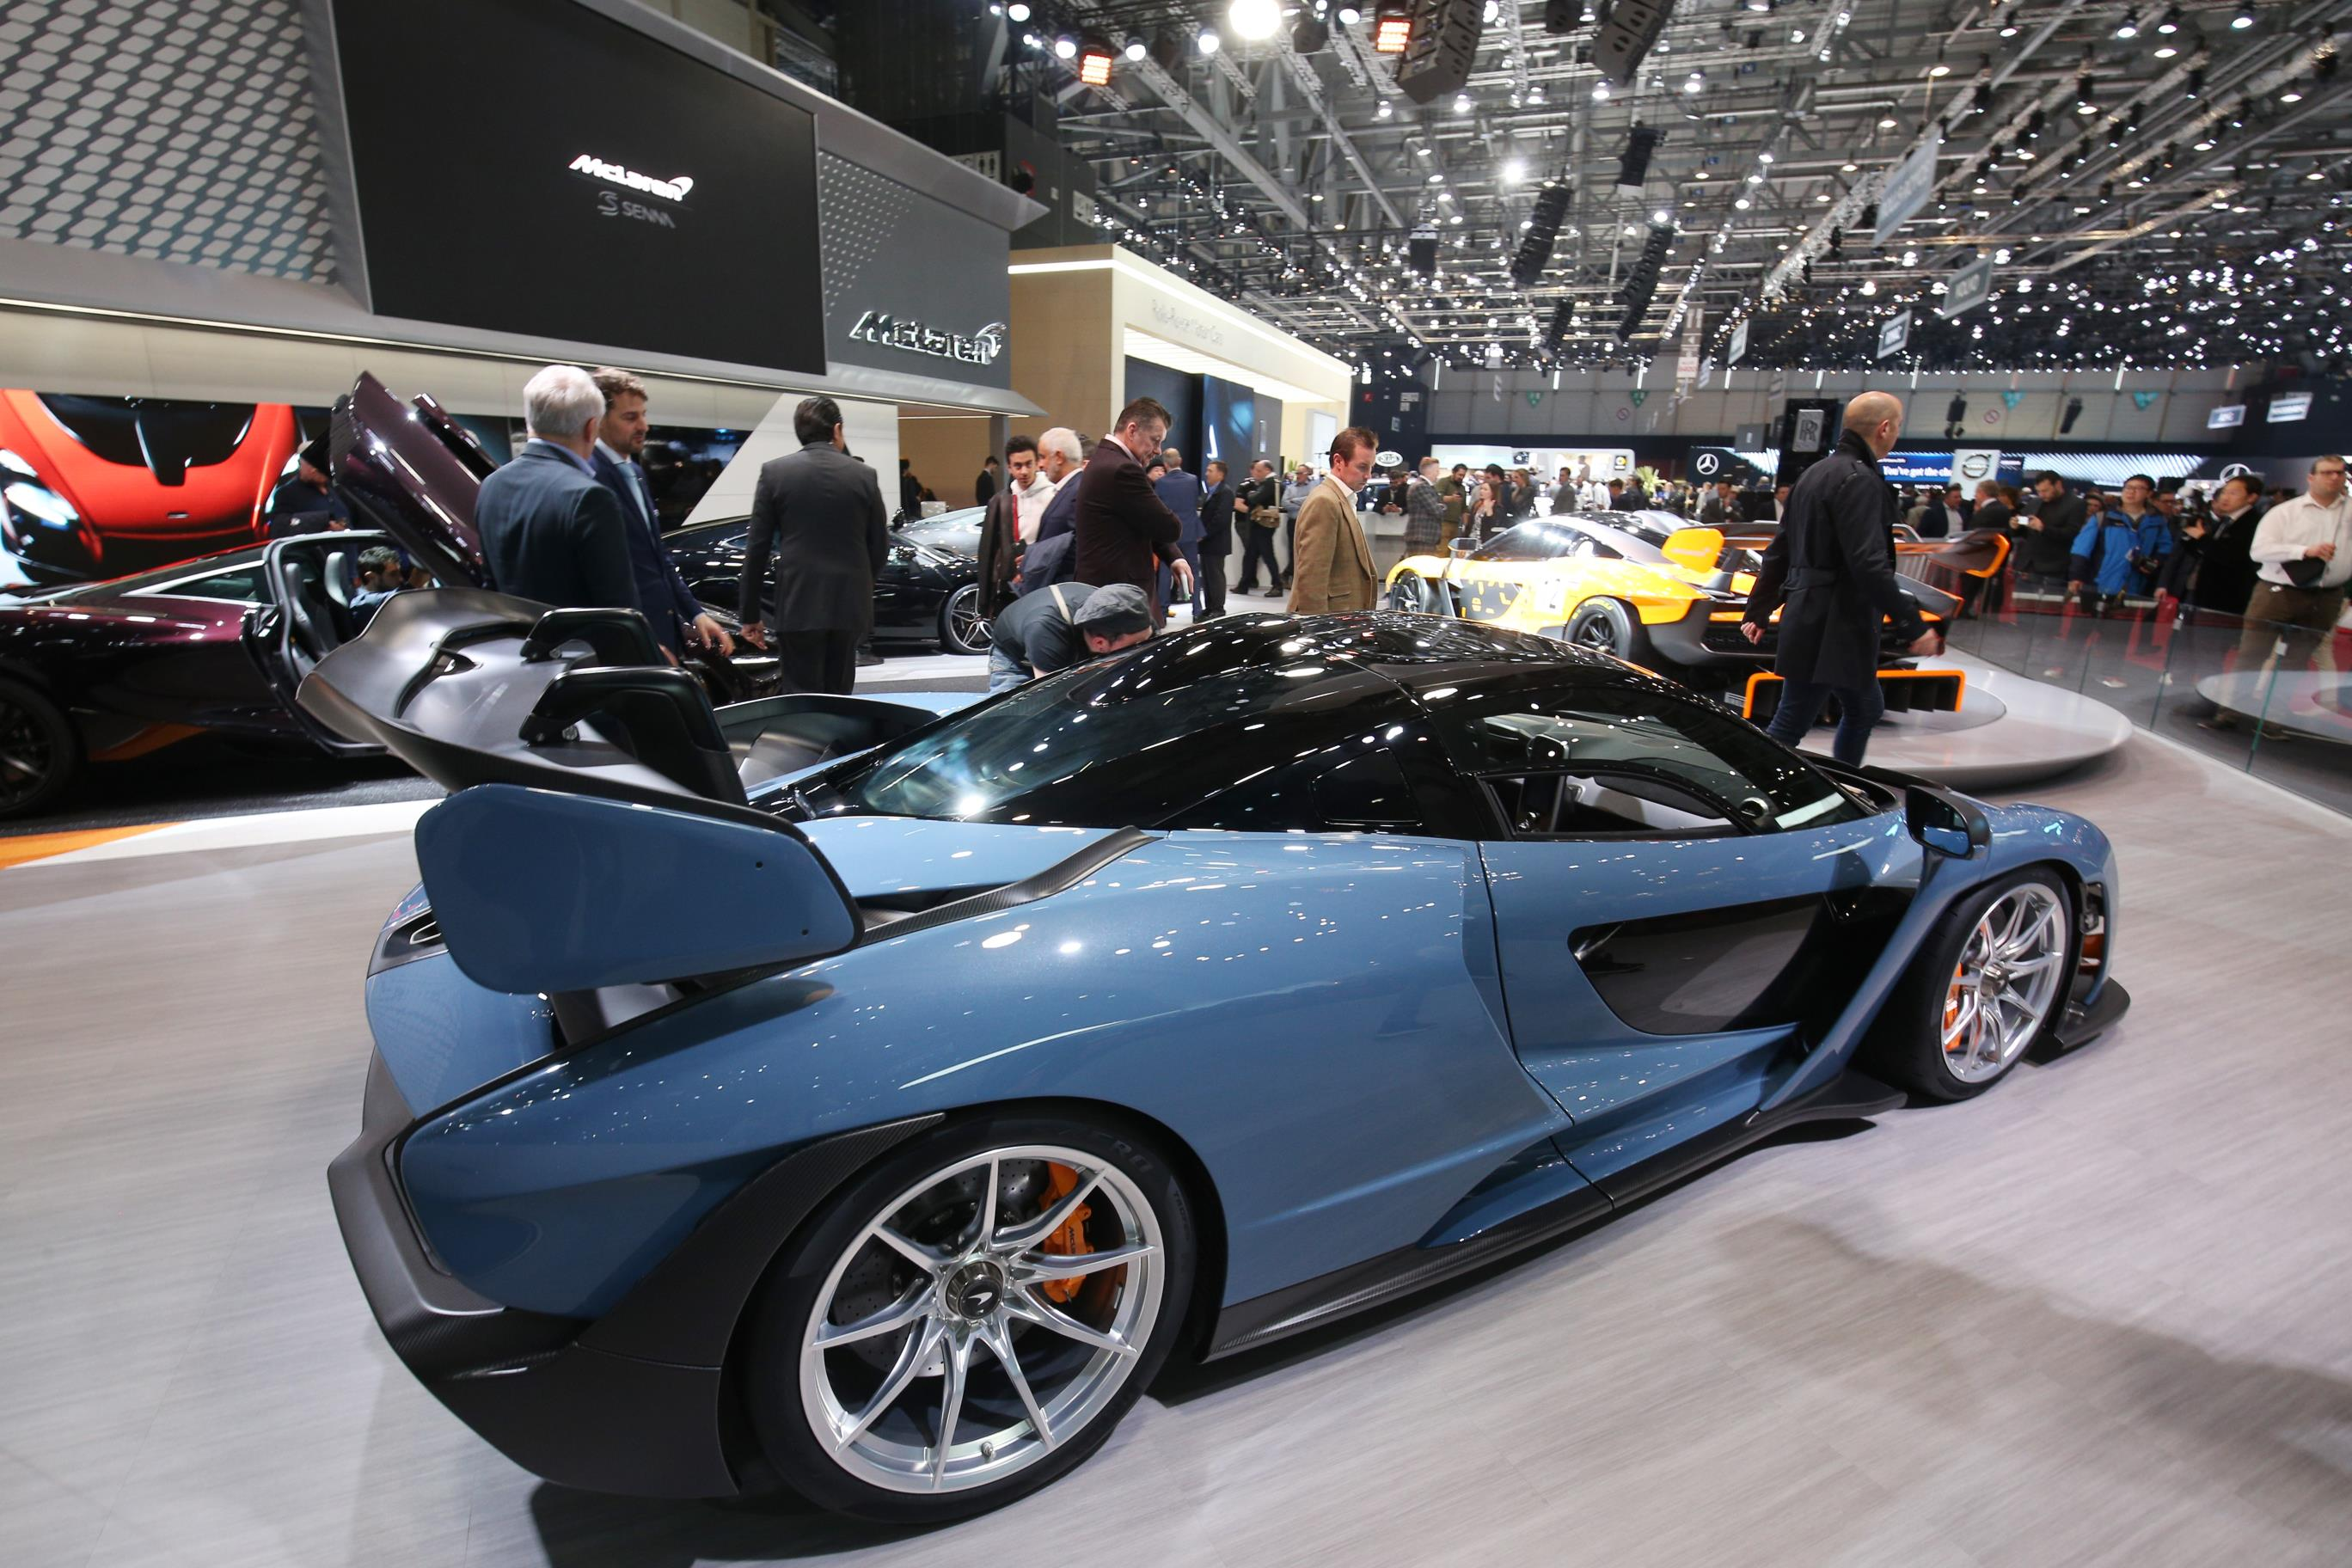 Geneva Motor Show 2018 Mega Gallery Part 1 (276)